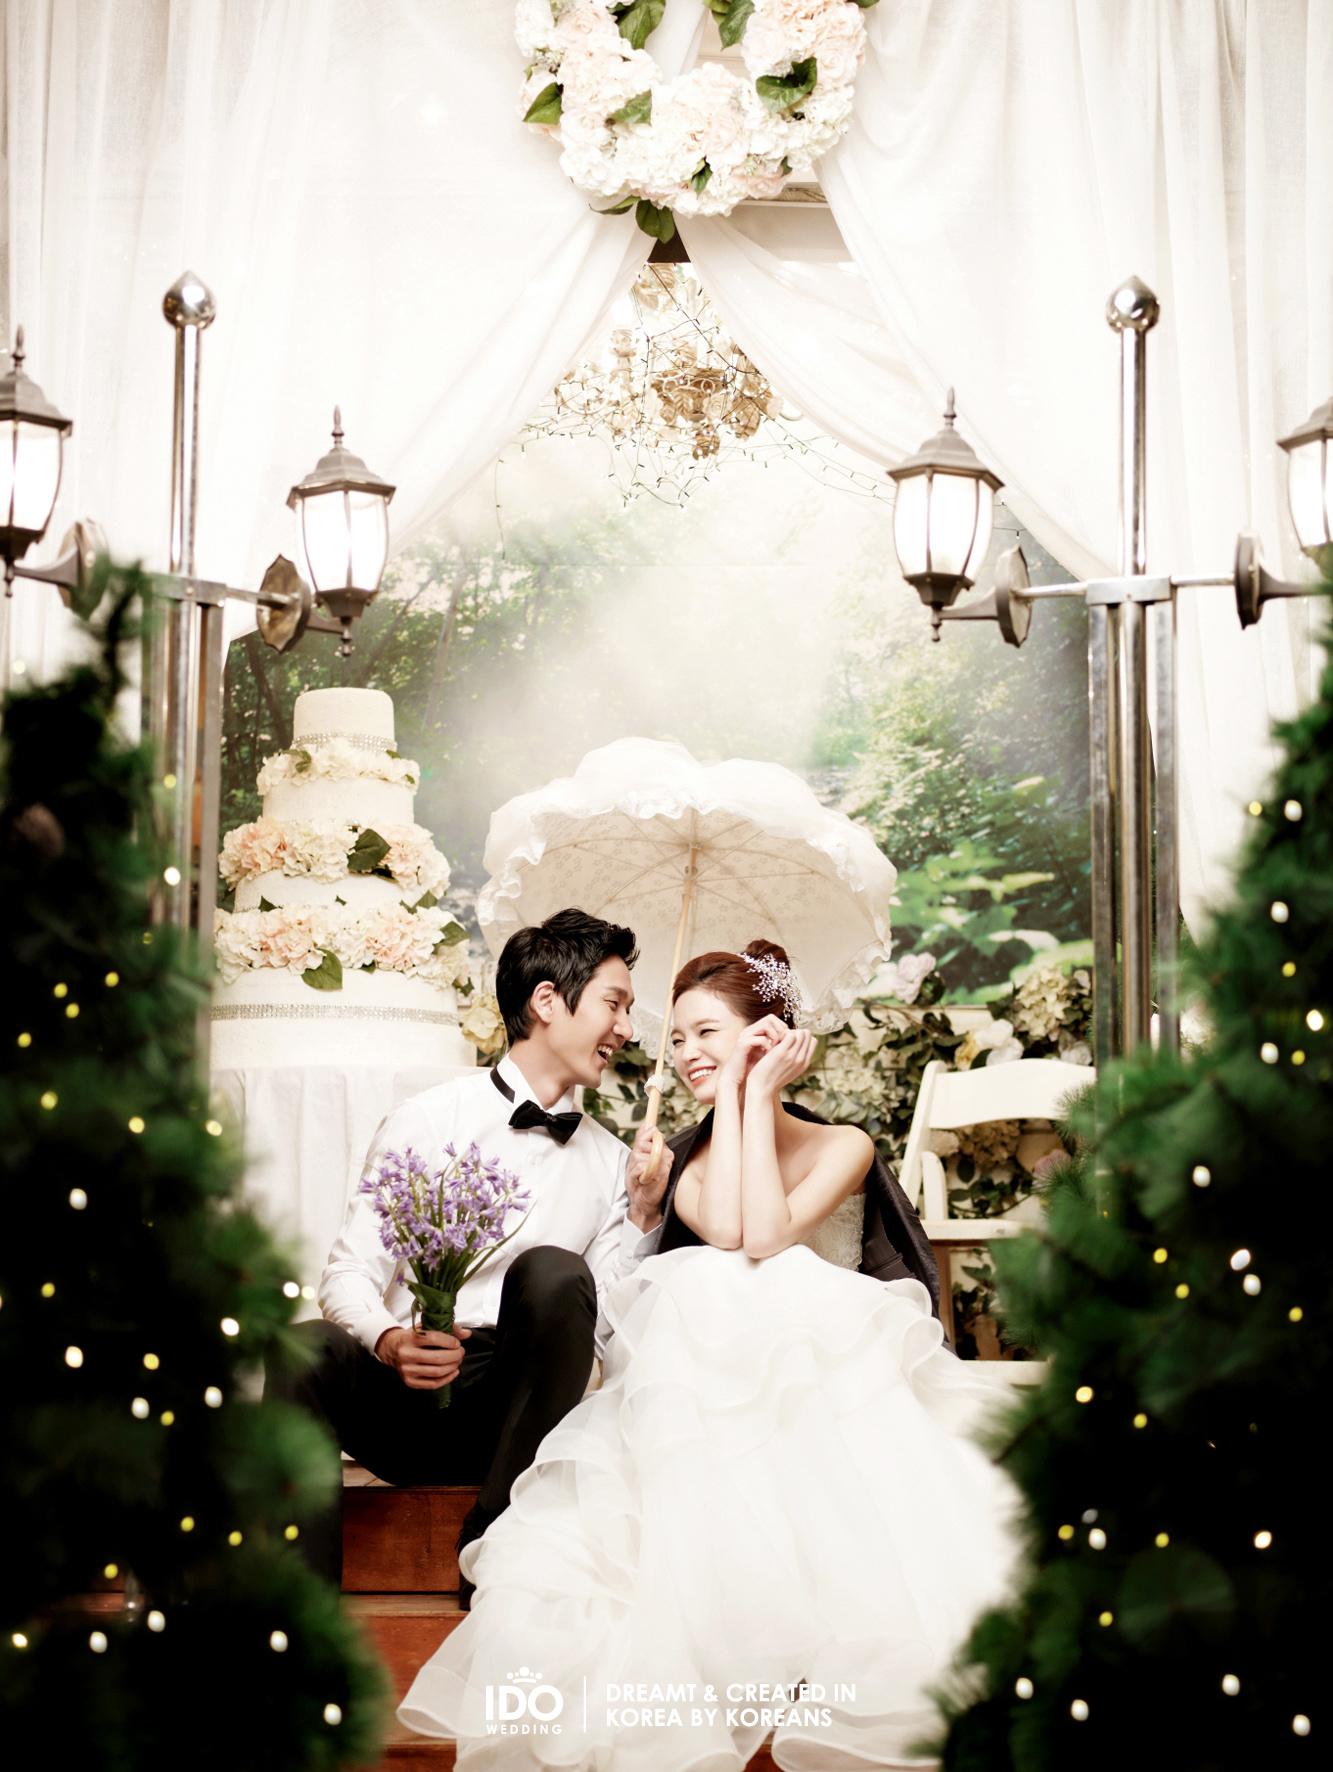 Korea Pre-wedding Photo Studio SS32C | Korean Wedding Photo - IDO ...